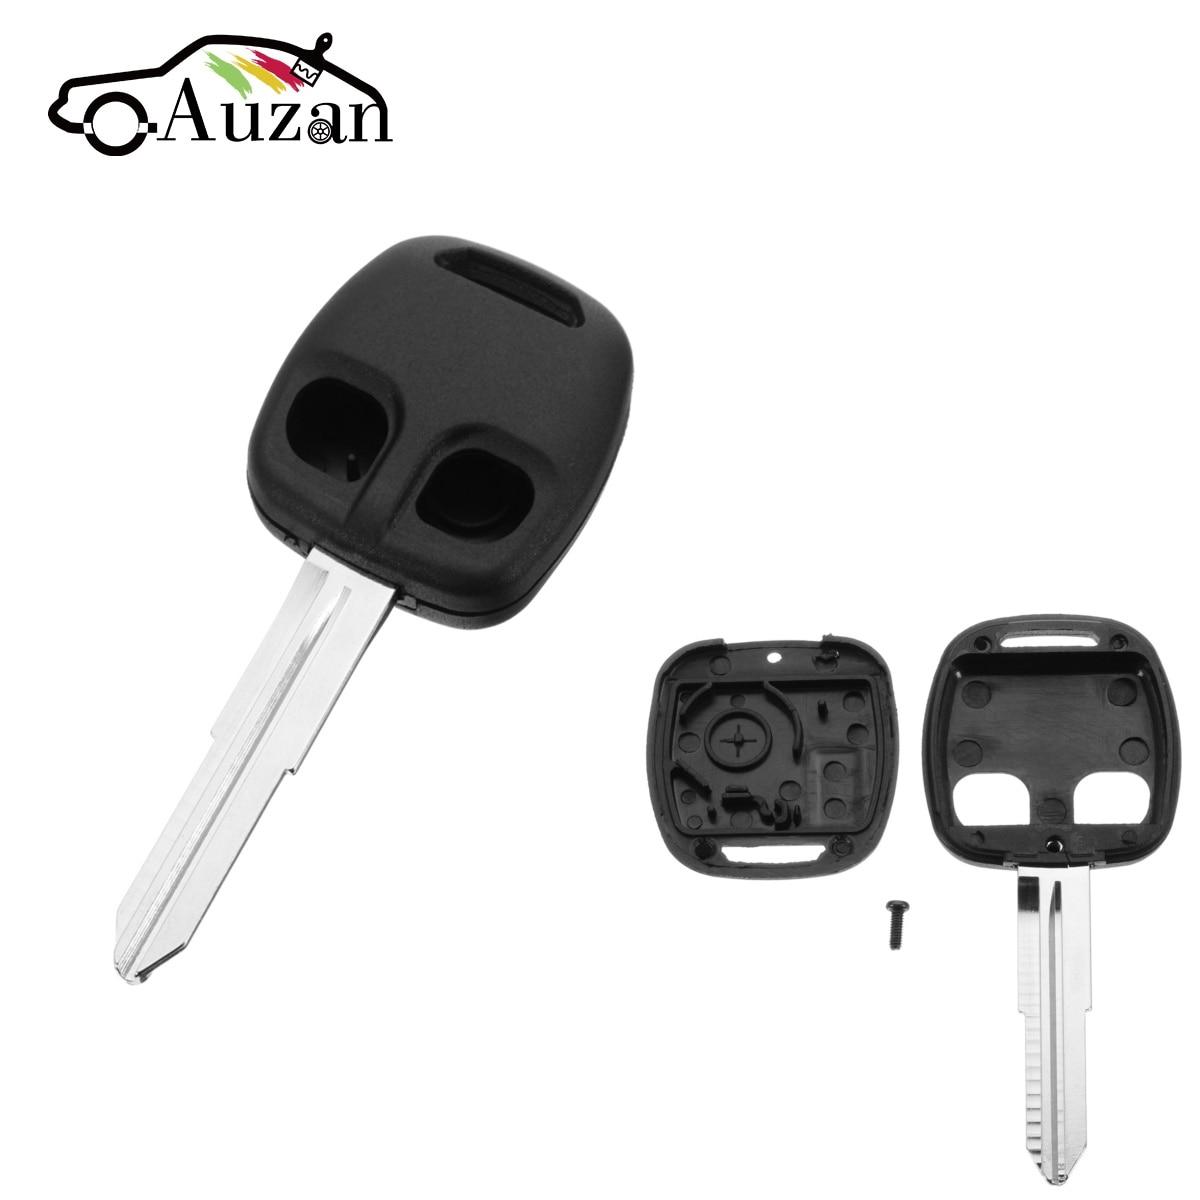 2 Button Car Remote Key Shell MIT11R Blade Case Fob For MITSUBISHI Lancer Evo L200 Shogun Pajero Key Replacement